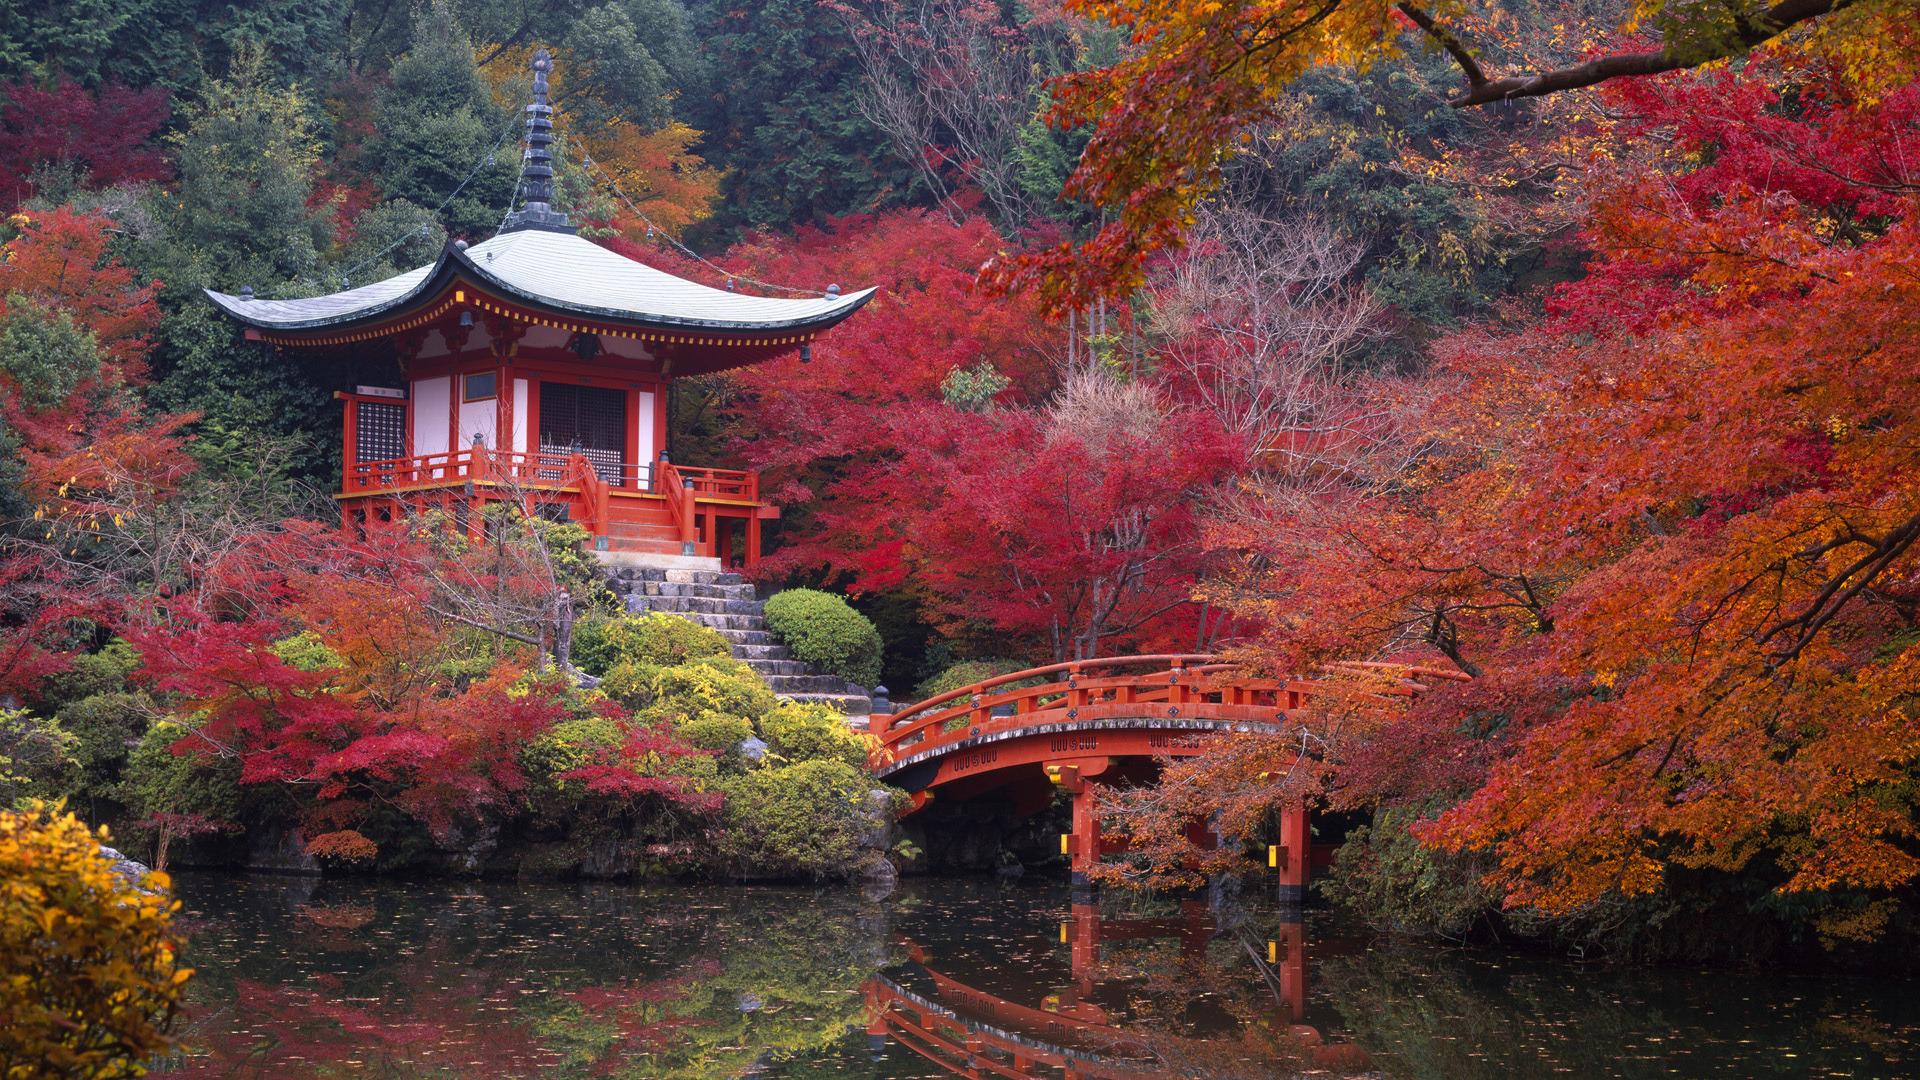 Bagni Tradizionali Giapponesi ~ avienix.com for .